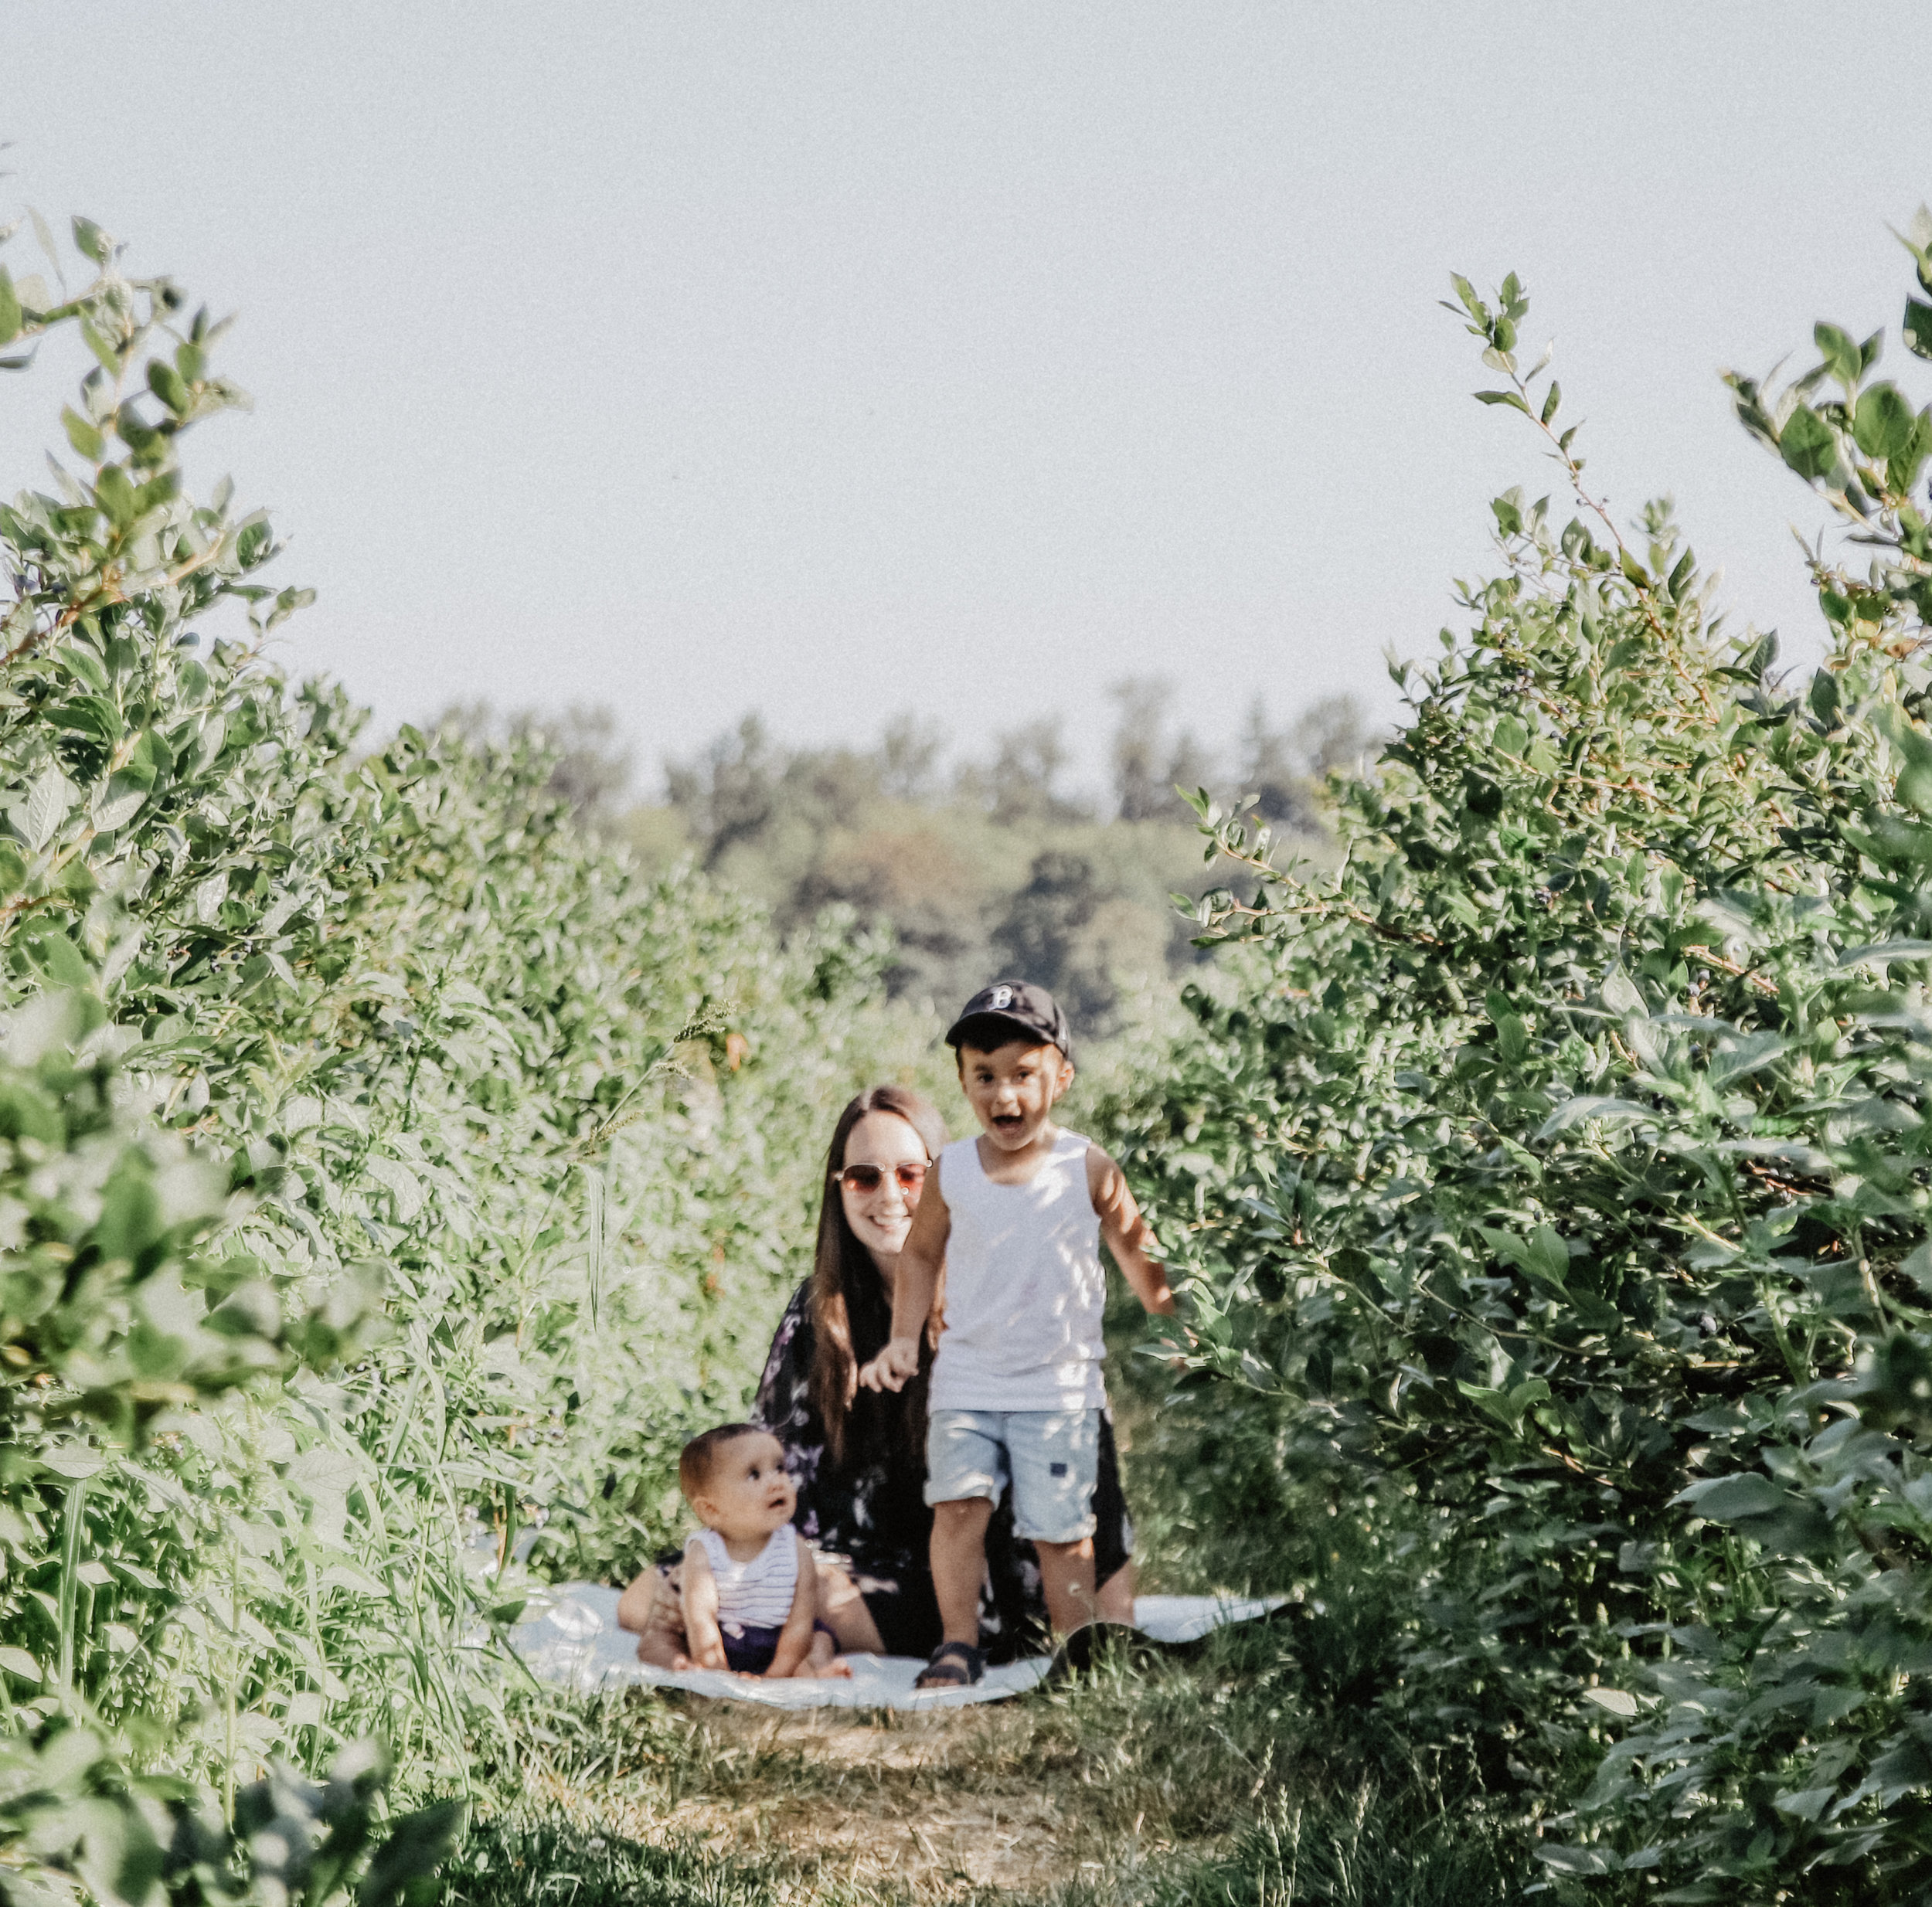 Driediger farms-13.jpg